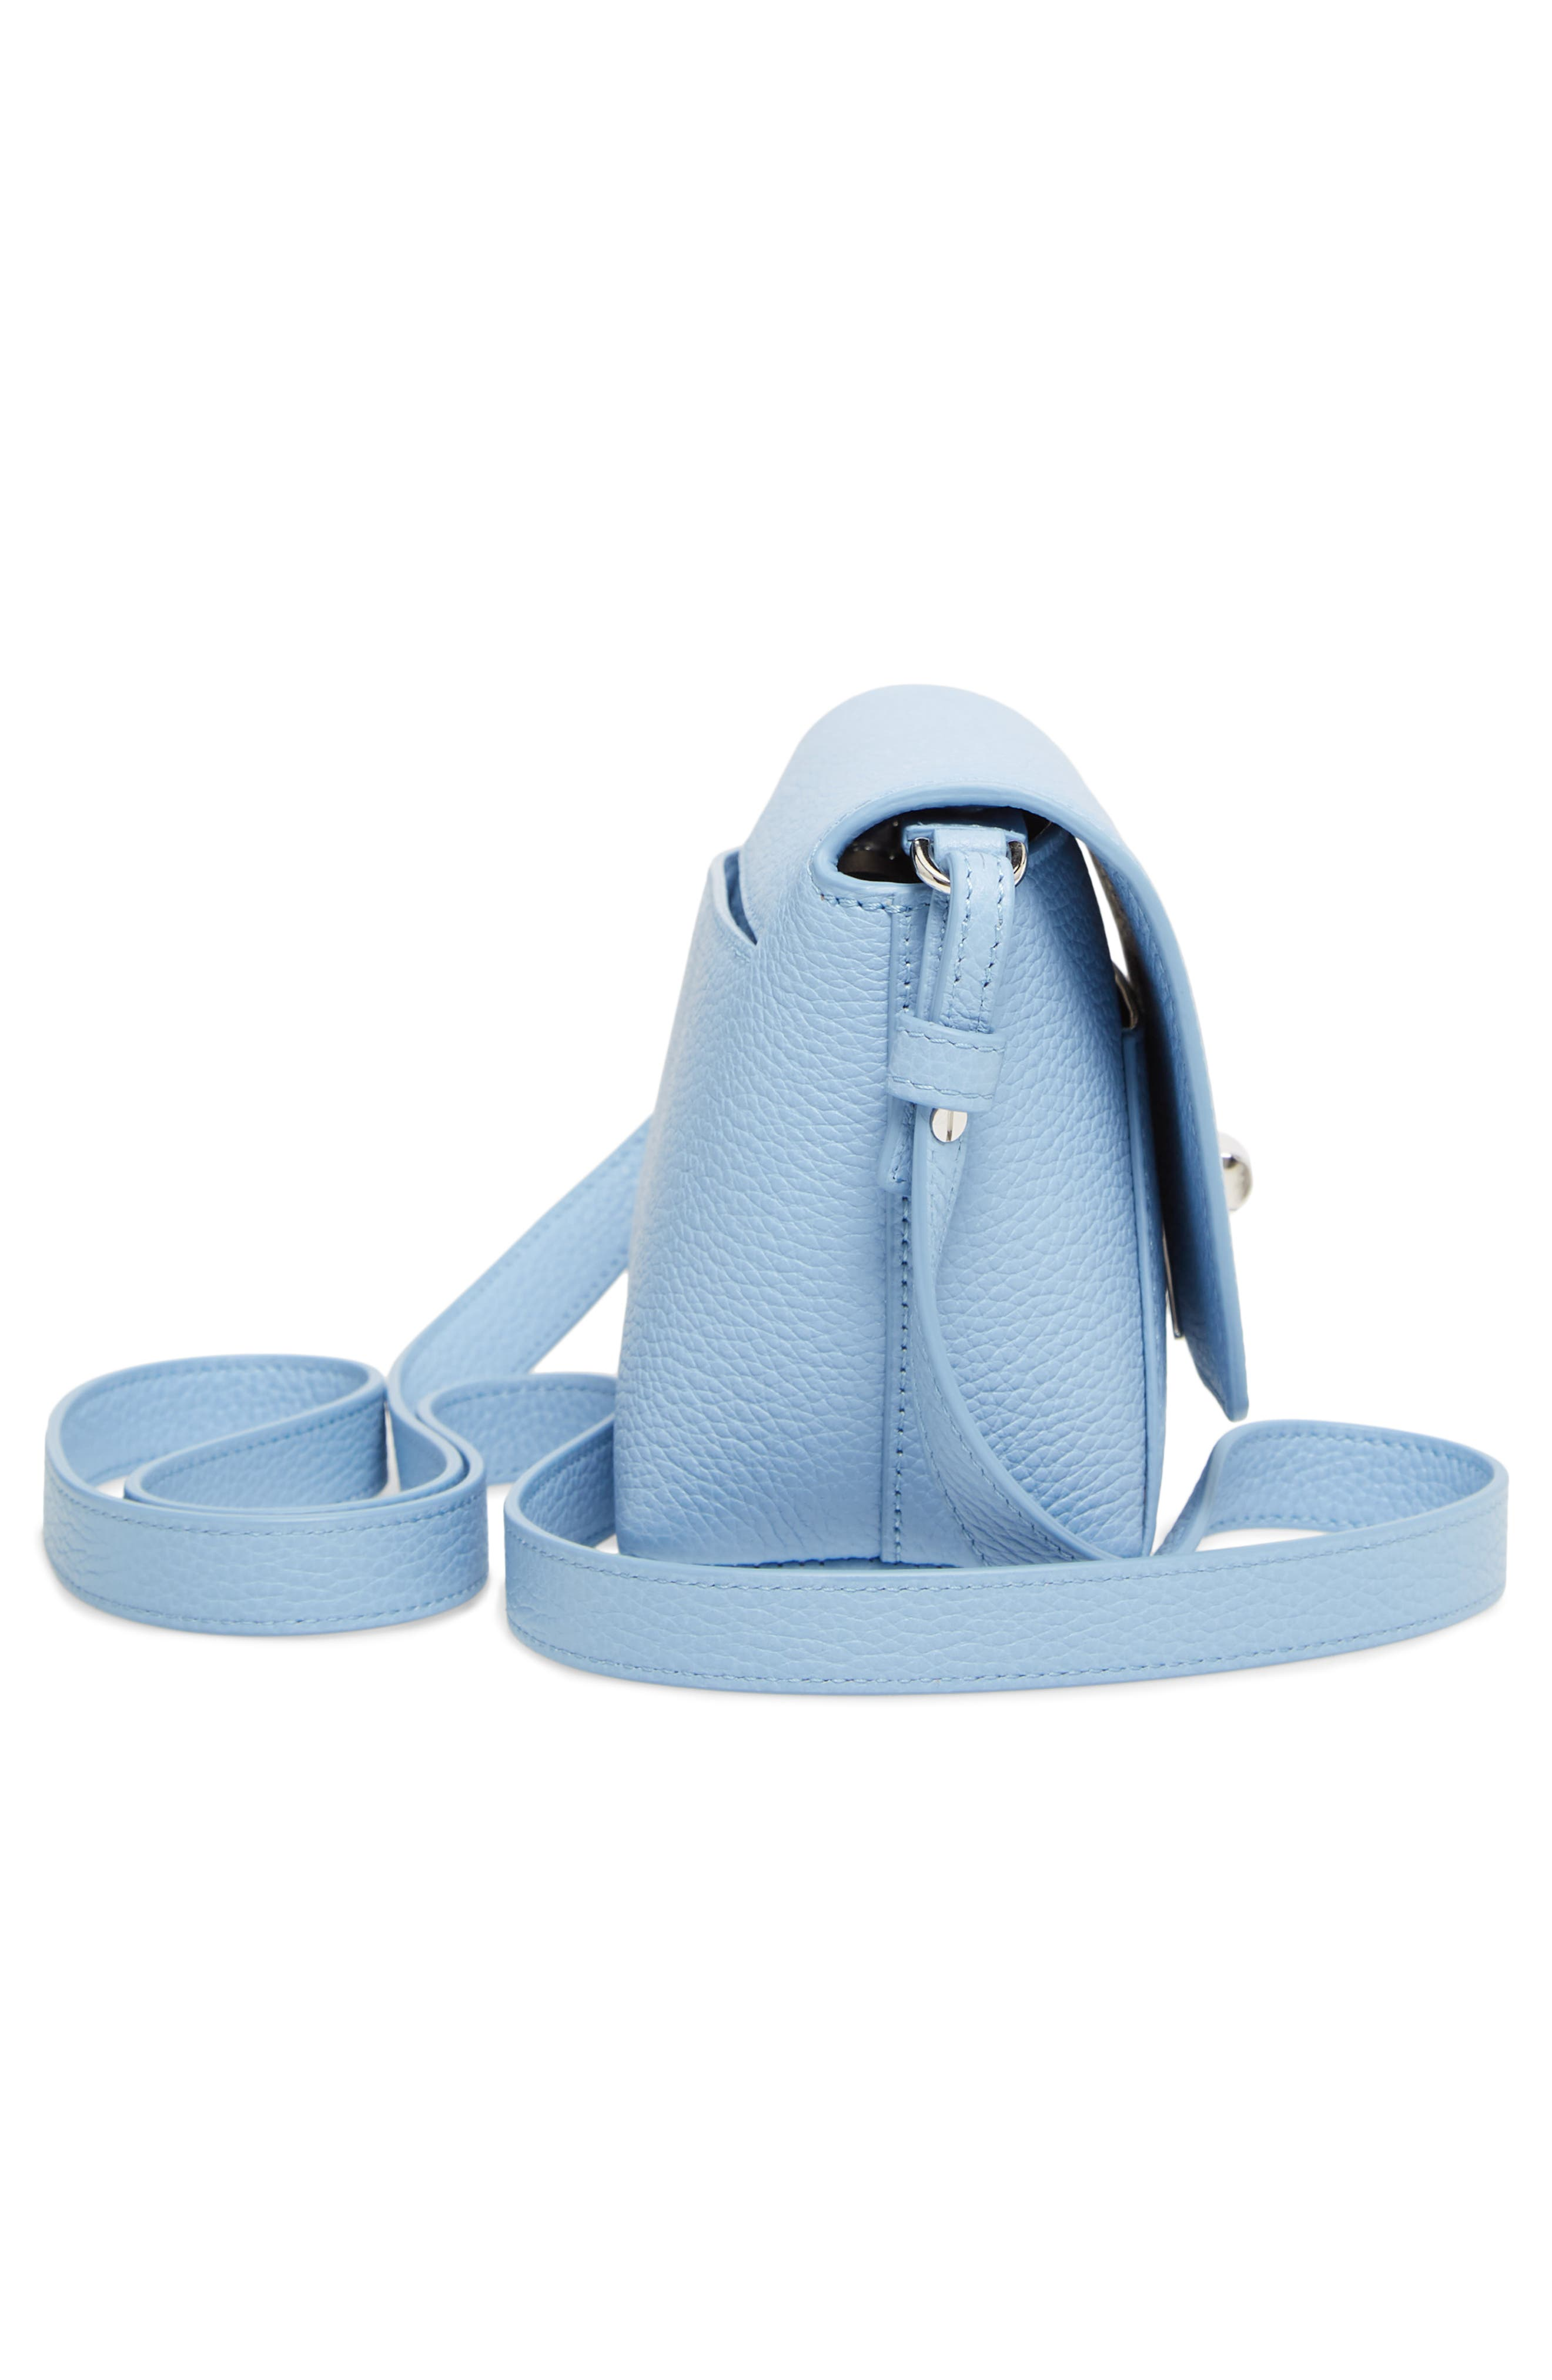 Little Anouk Calfskin Crossbody Bag,                             Alternate thumbnail 6, color,                             POWDER BLUE